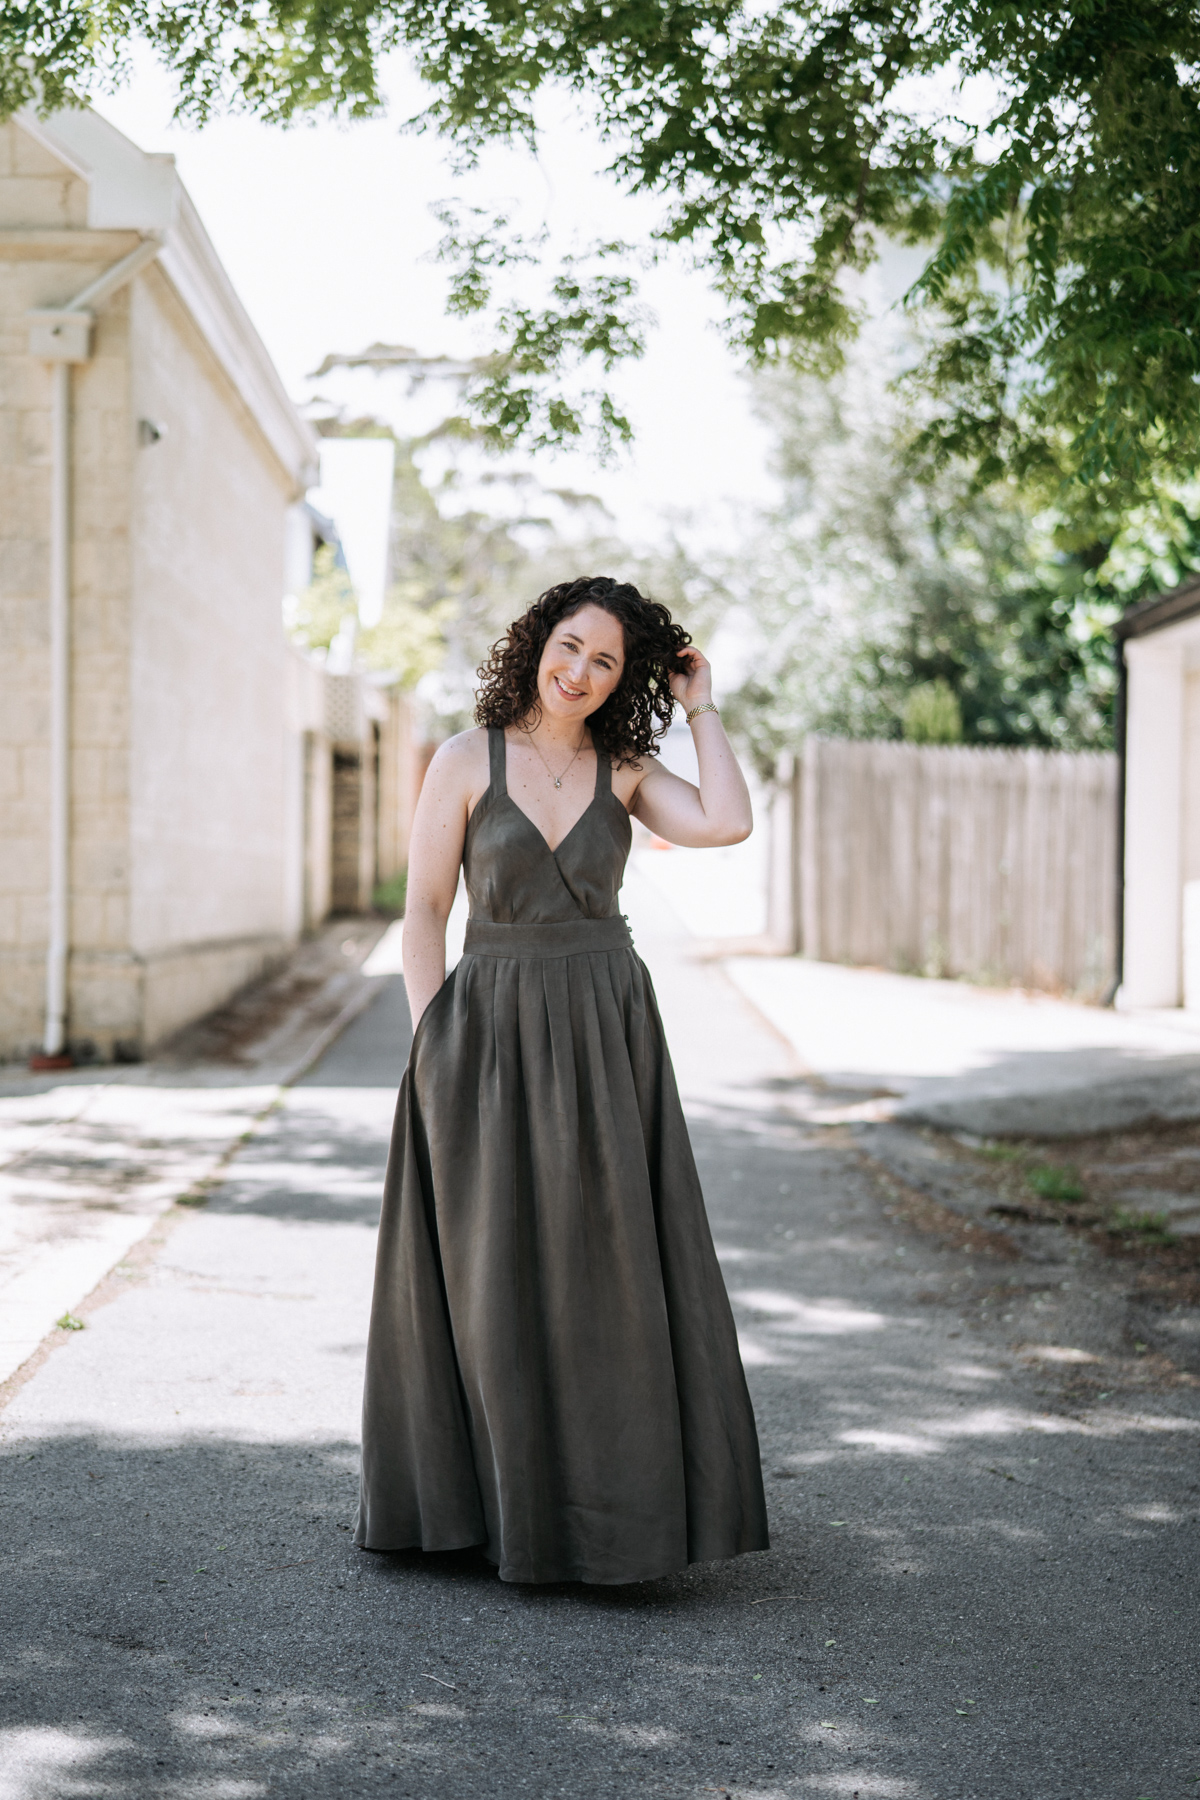 Megan Nielsen Nora dress for the 40 under 40 Awards evening